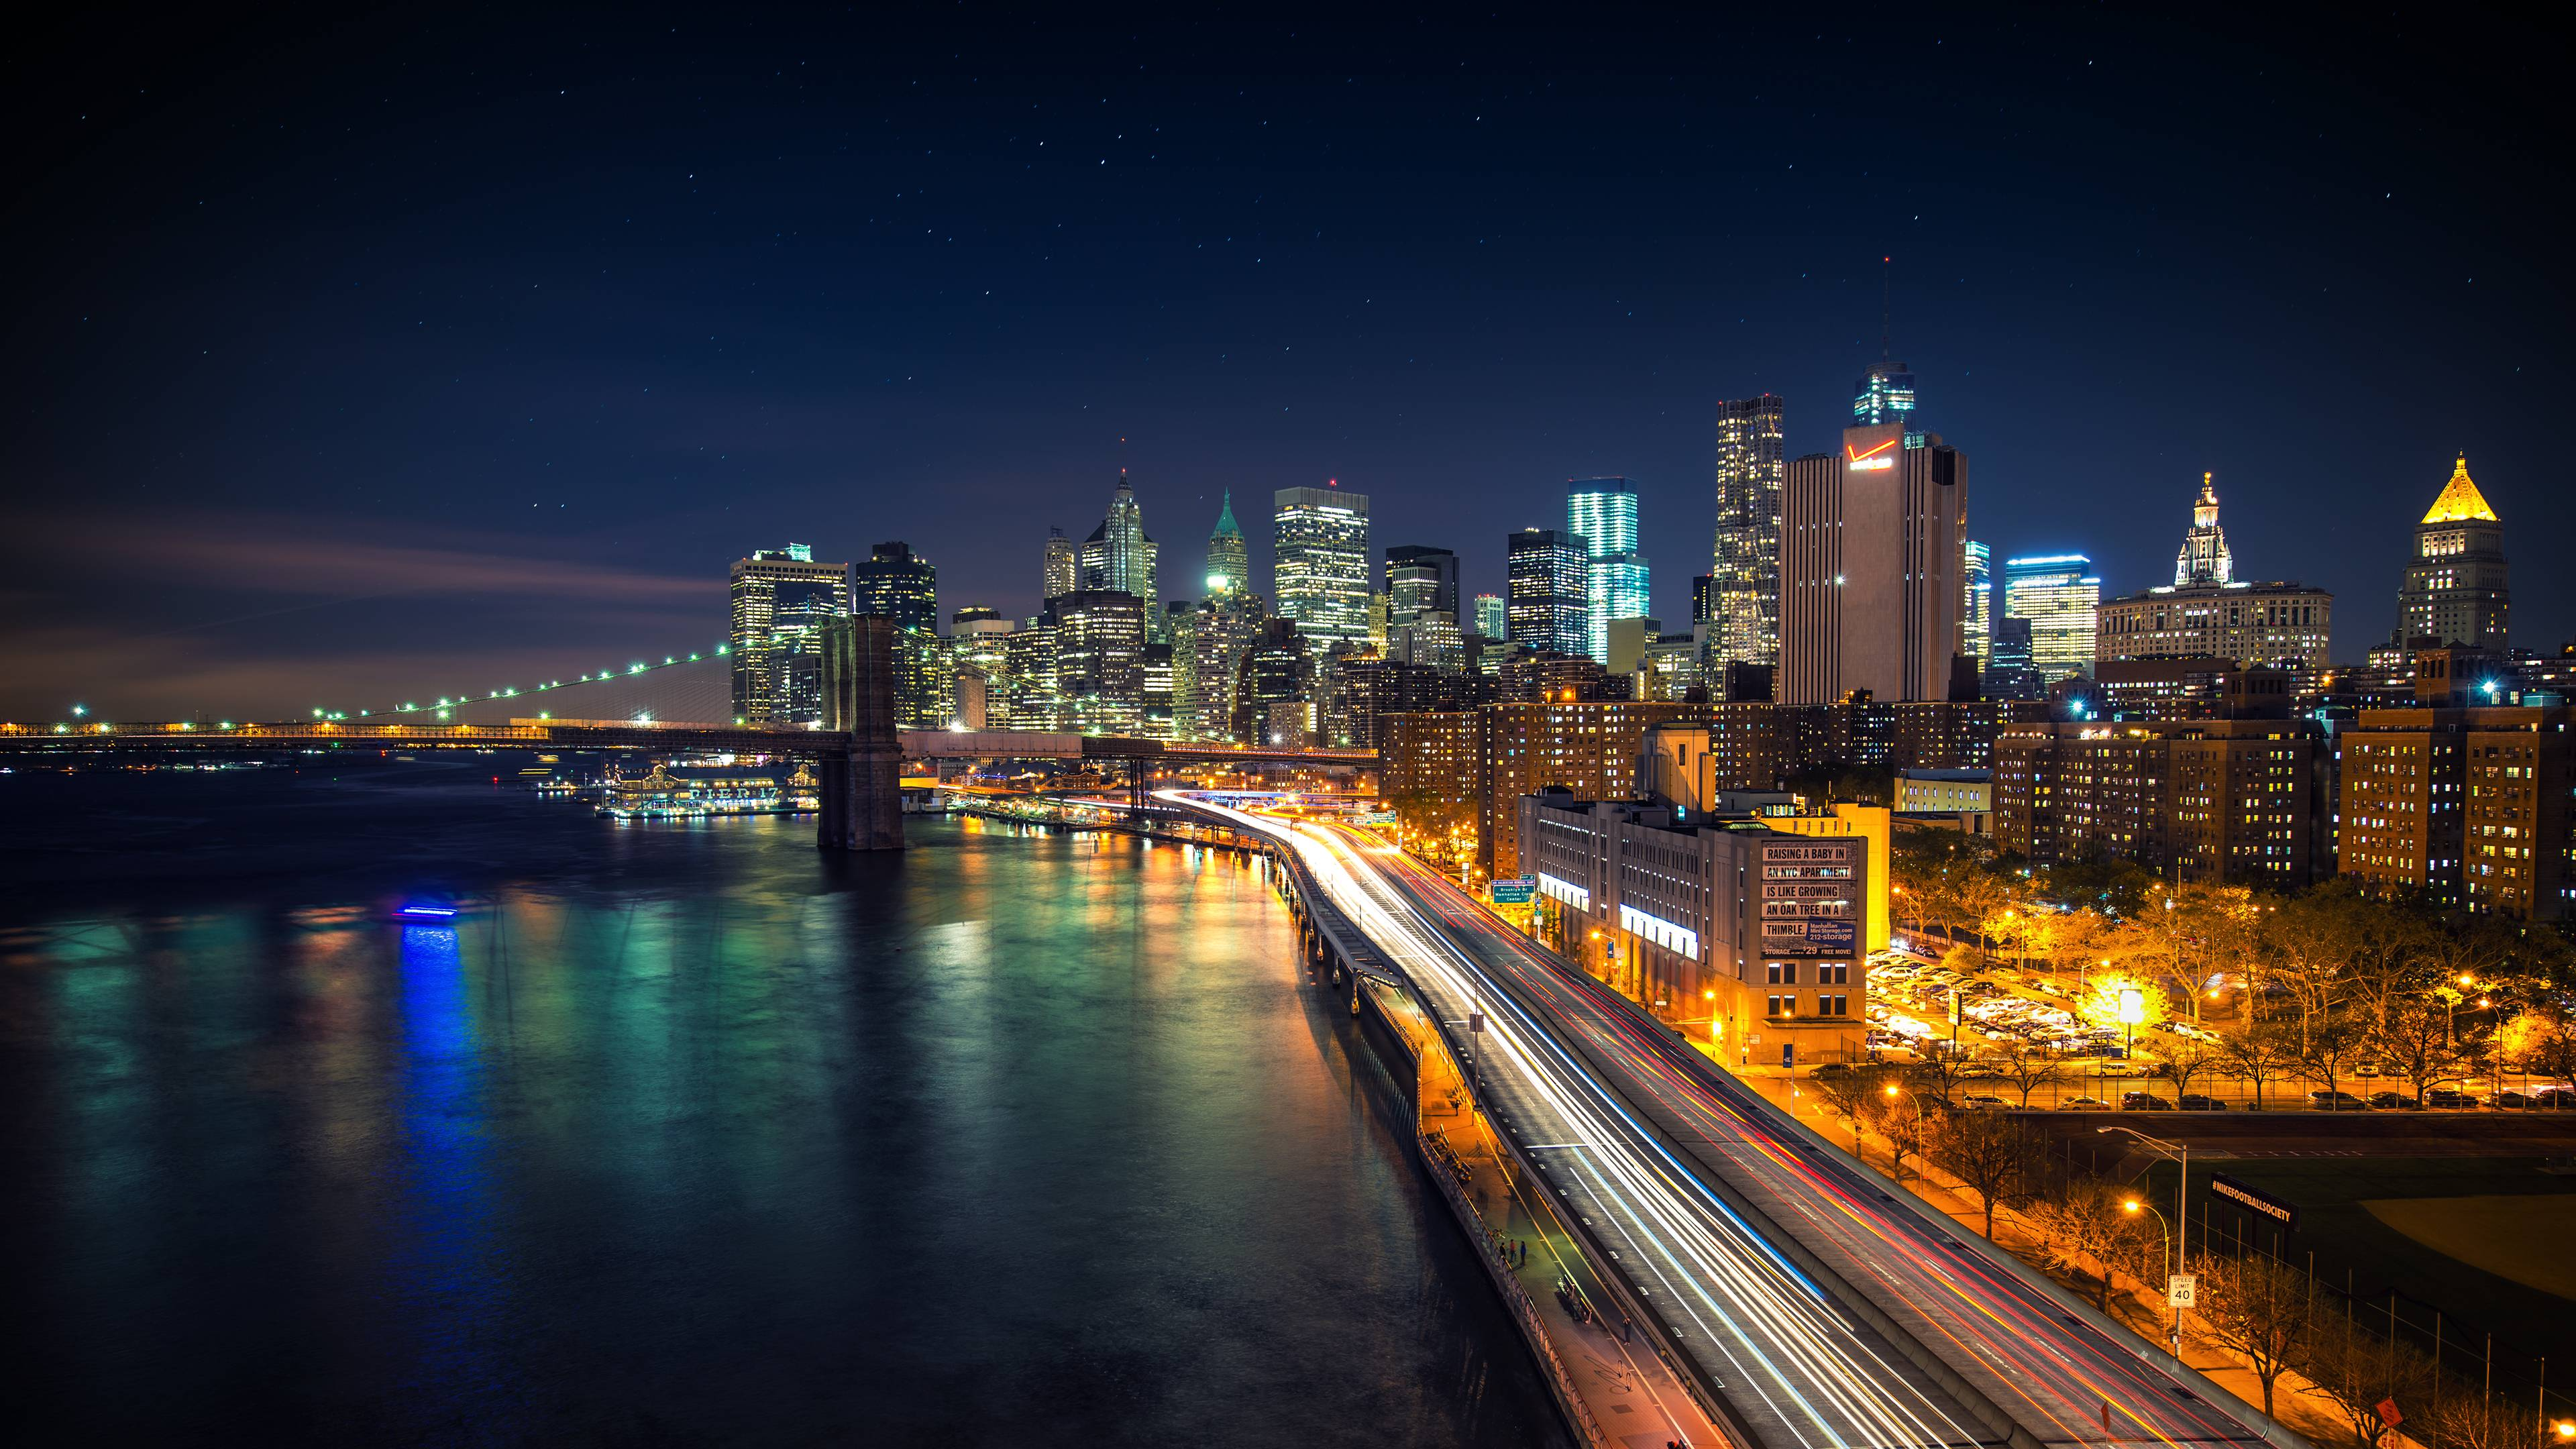 4K Wallpaper City Nighty City Lights